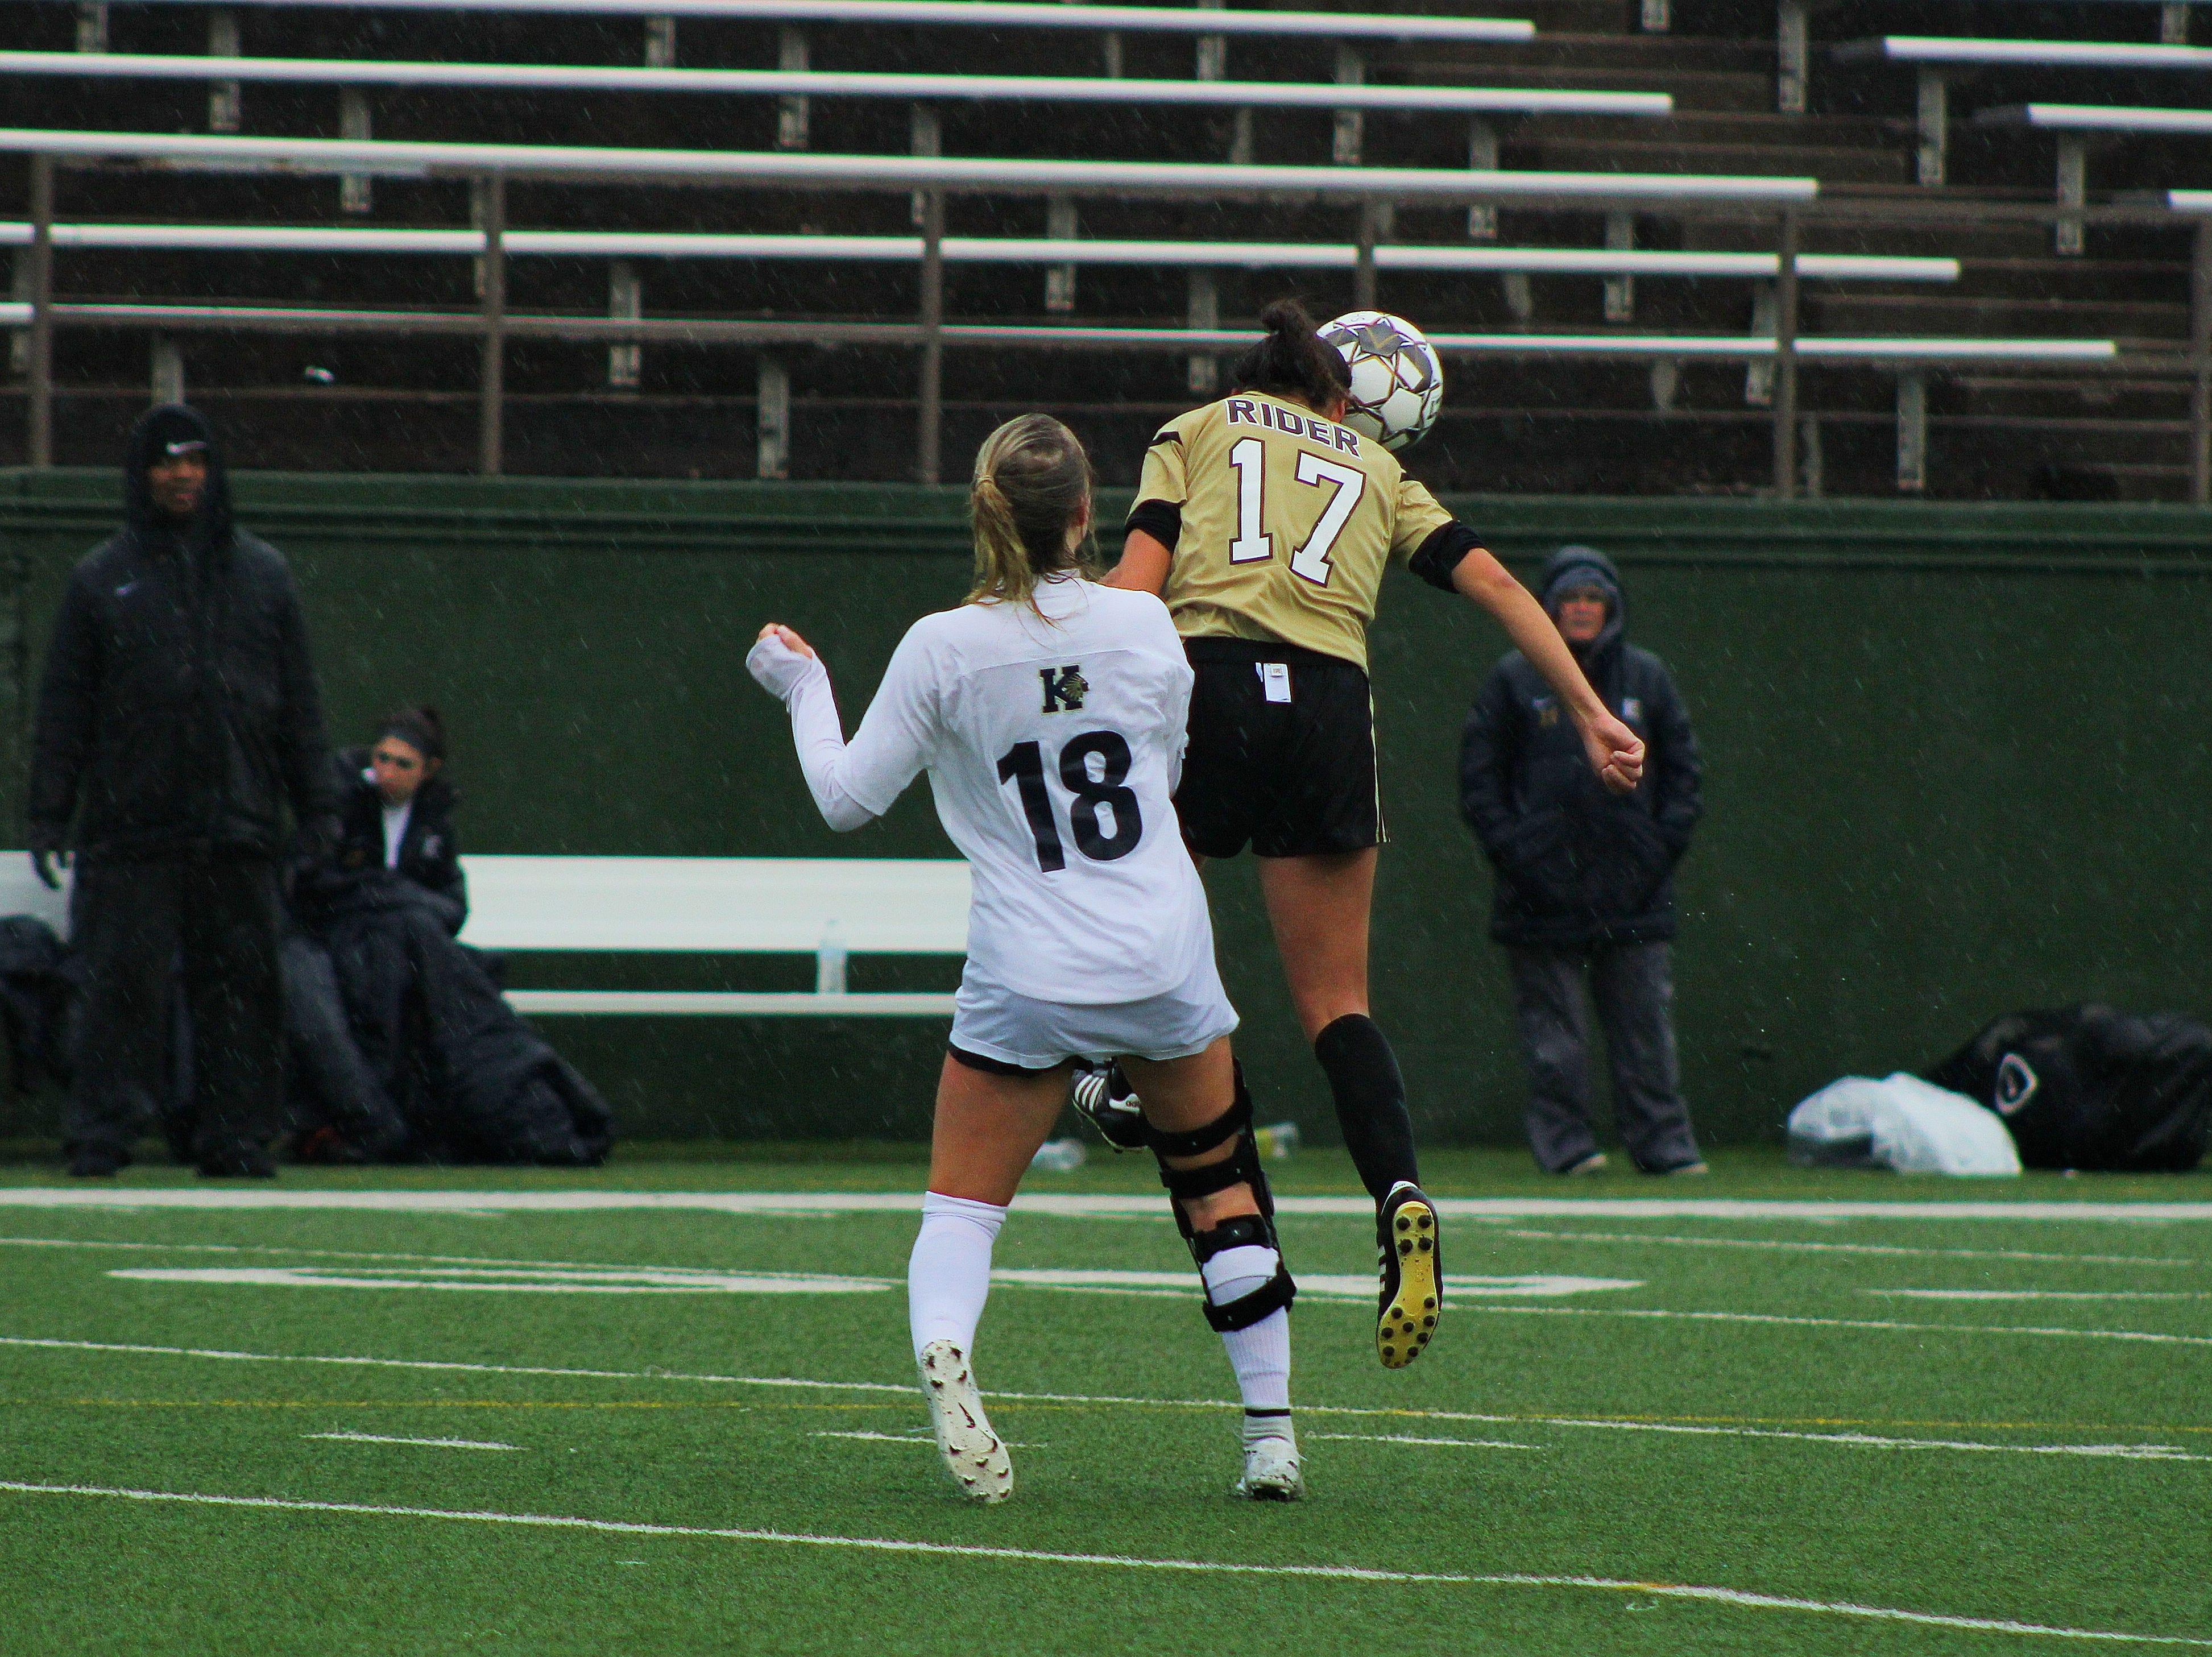 Freshman Jadyn Lopez heads the ball against Keller's Lucy Meadows.